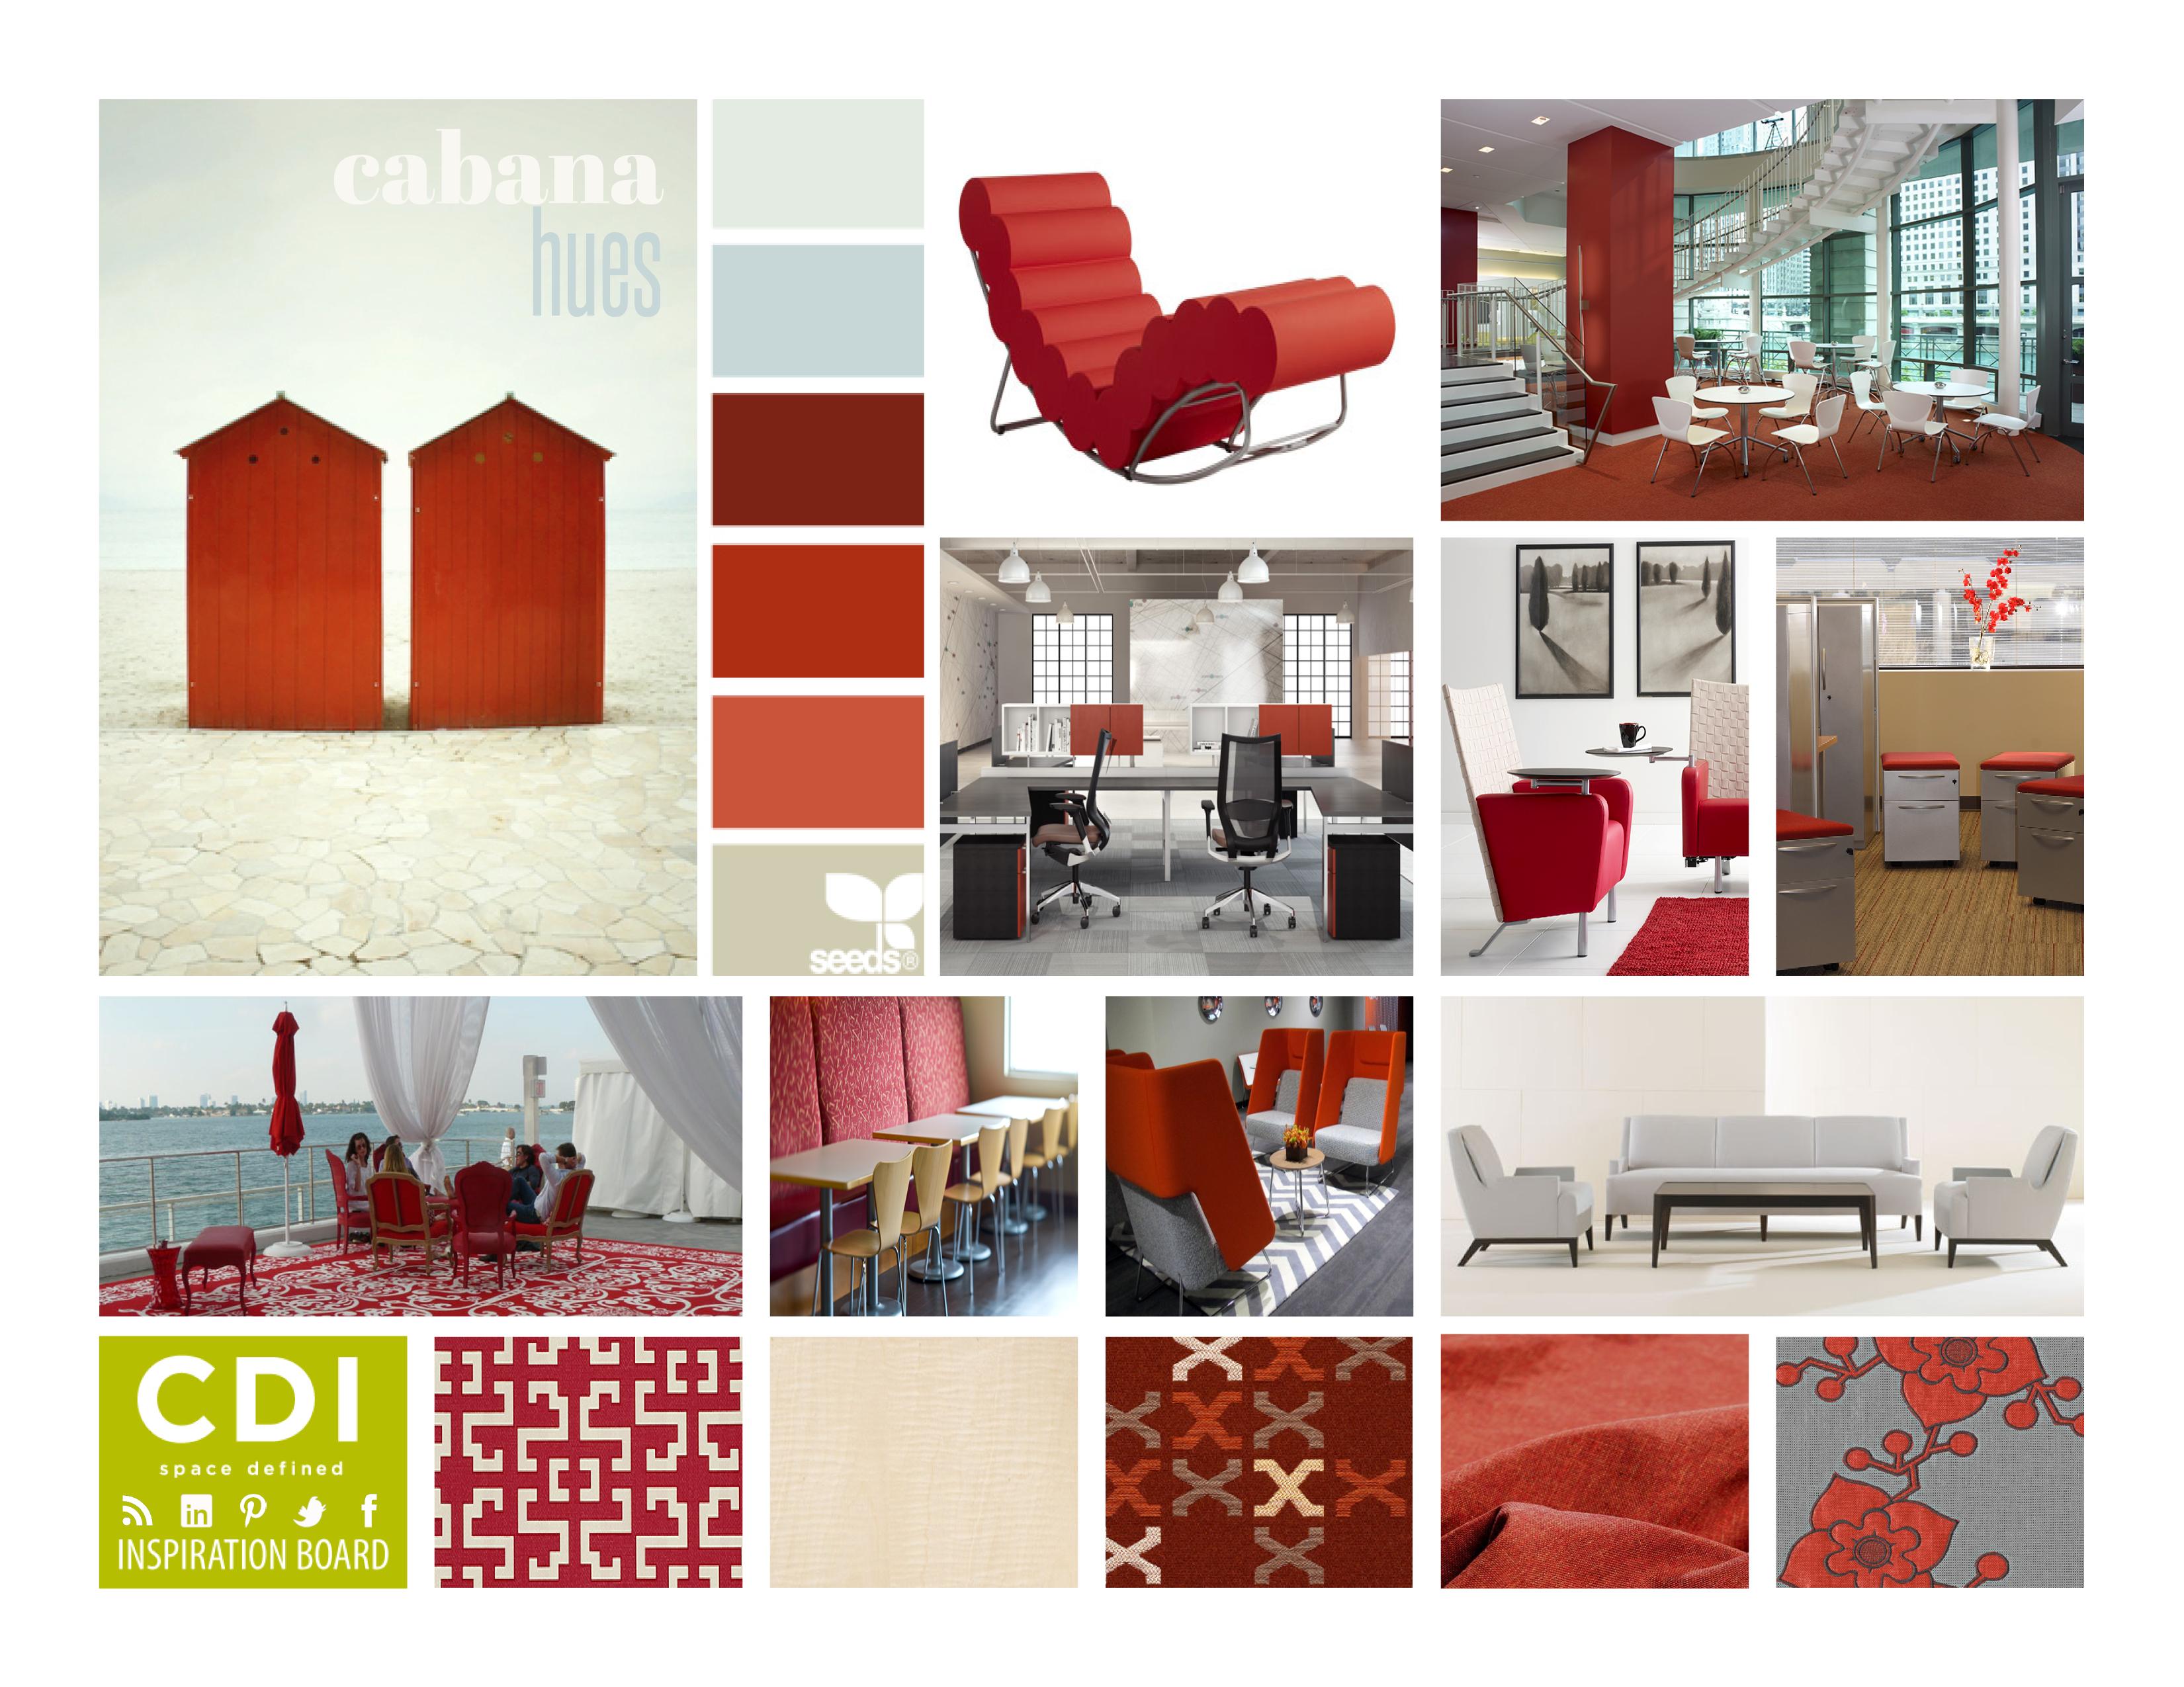 Inspiration board cabana hues corporate design interiors for Inspiration concept interior design llc